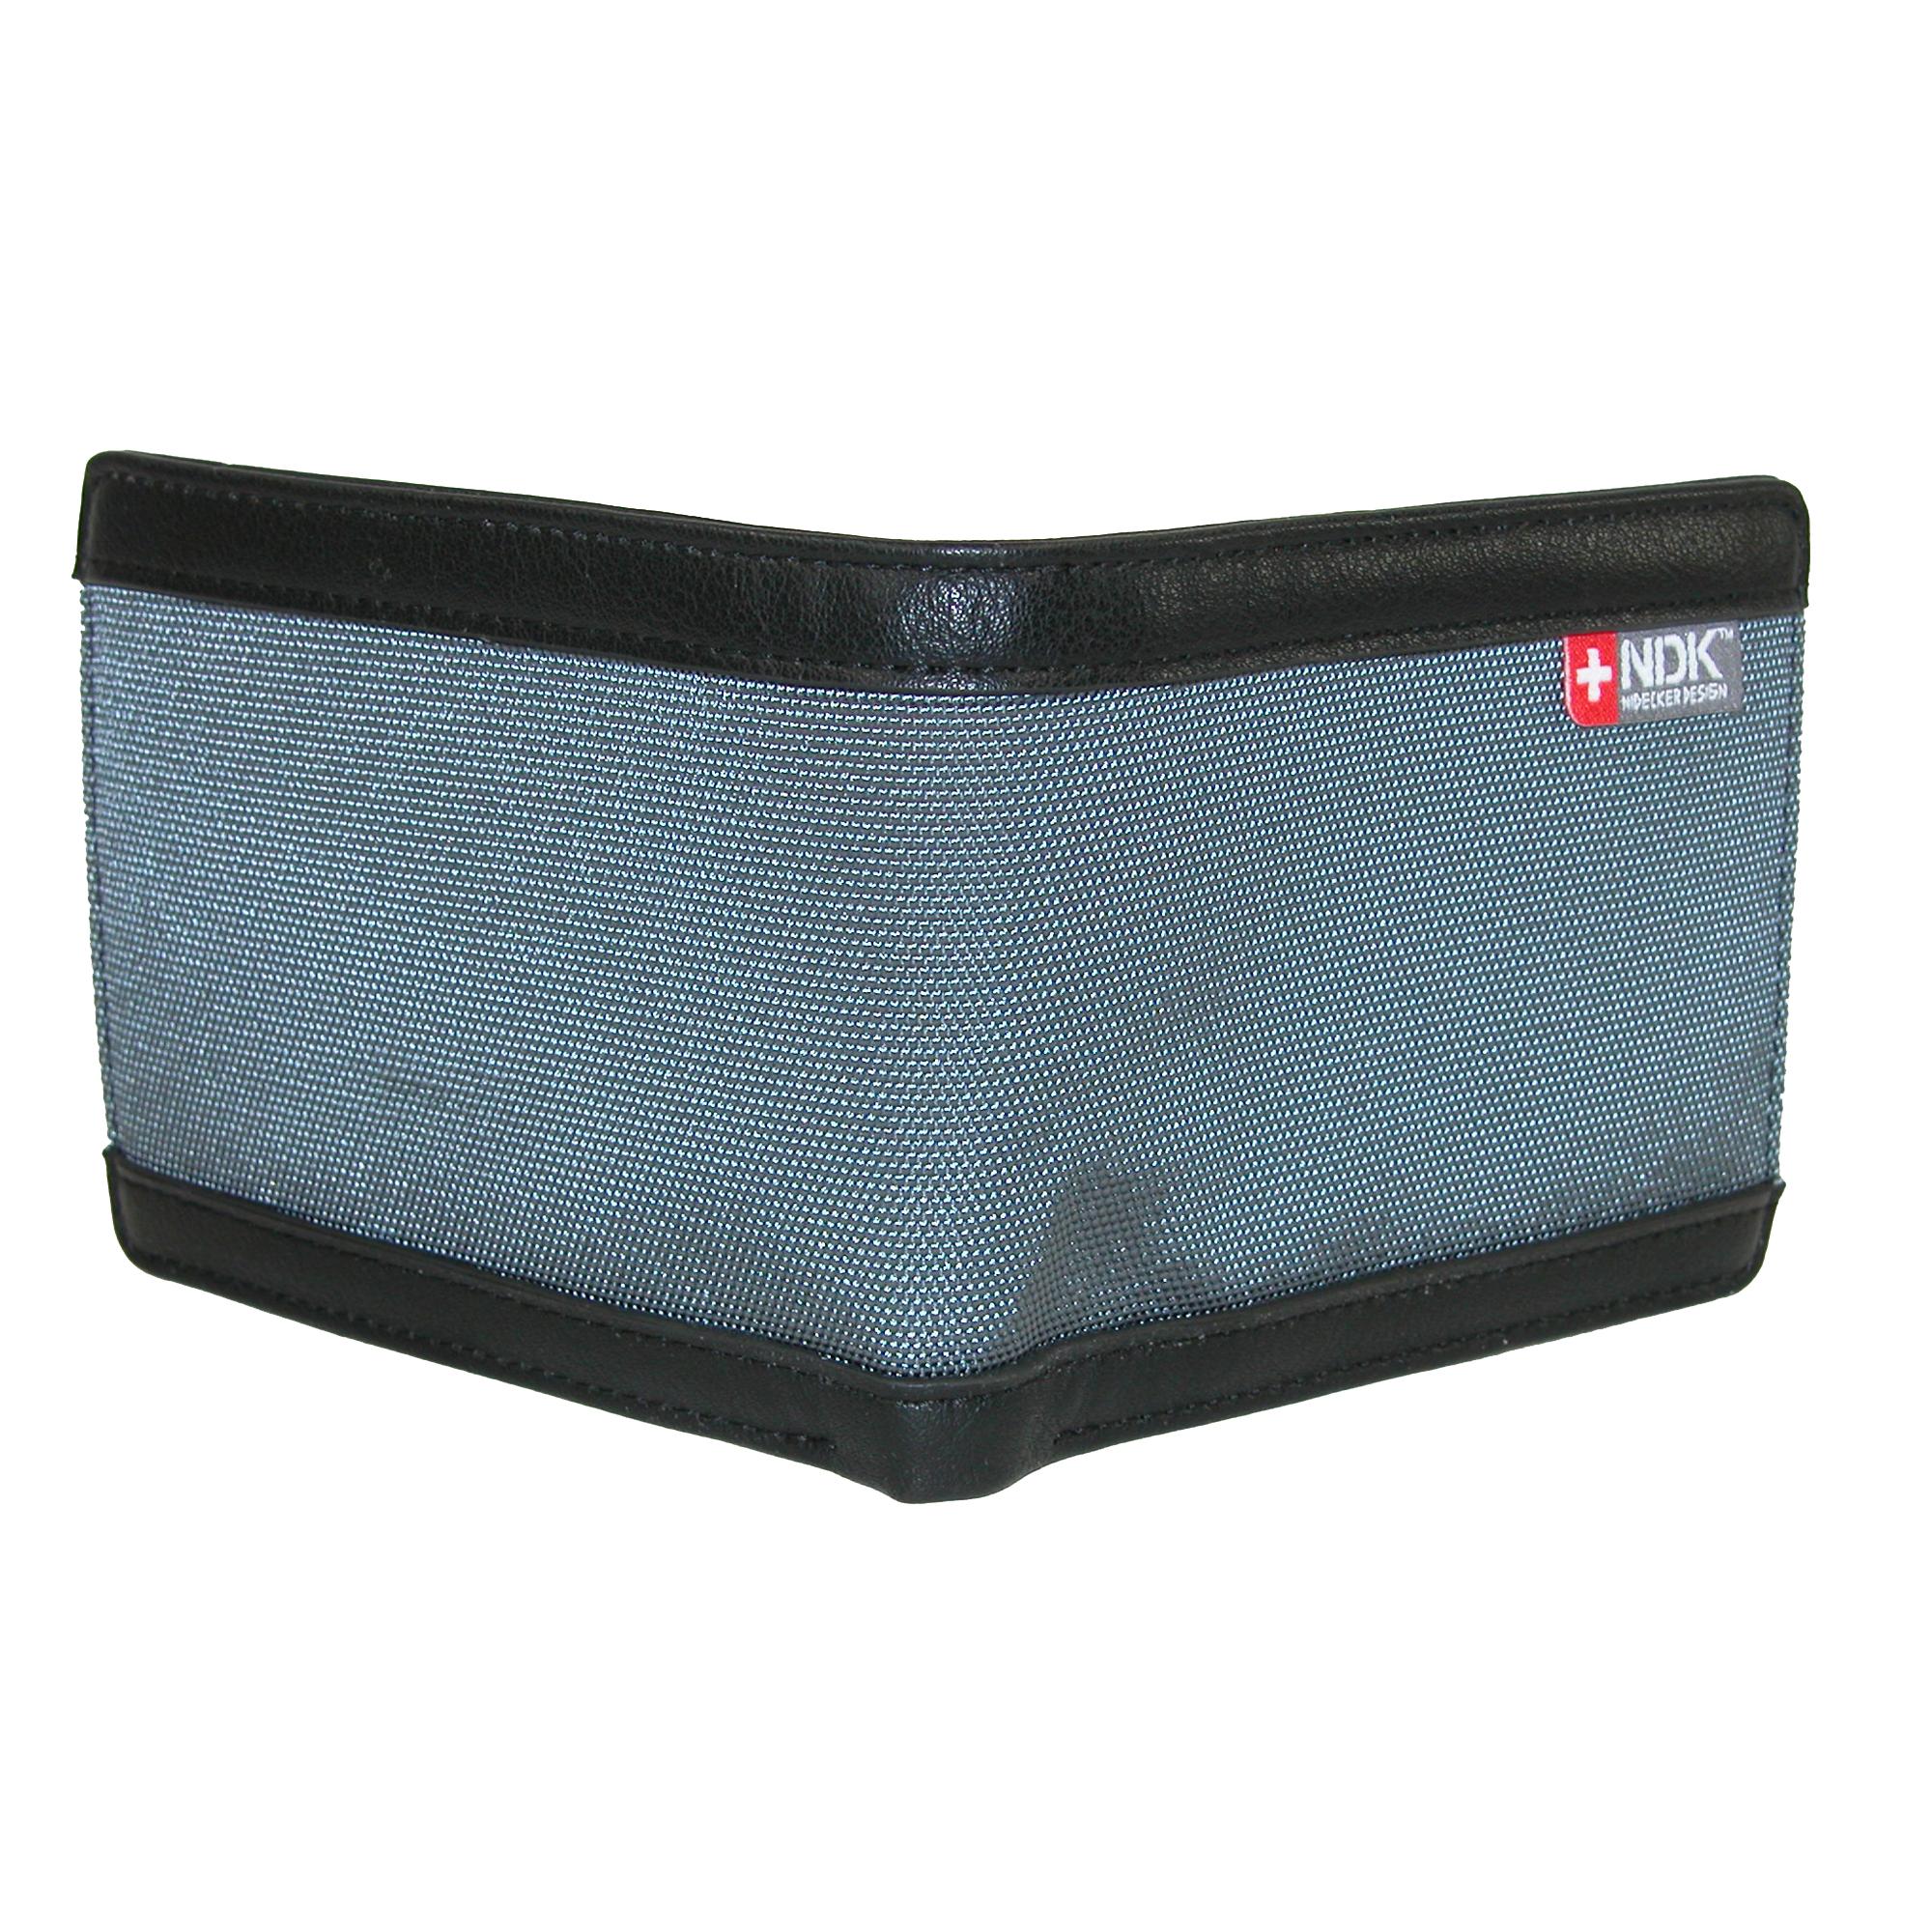 NDK Men's RFID Protected Bifold Wallet - image 1 of 4